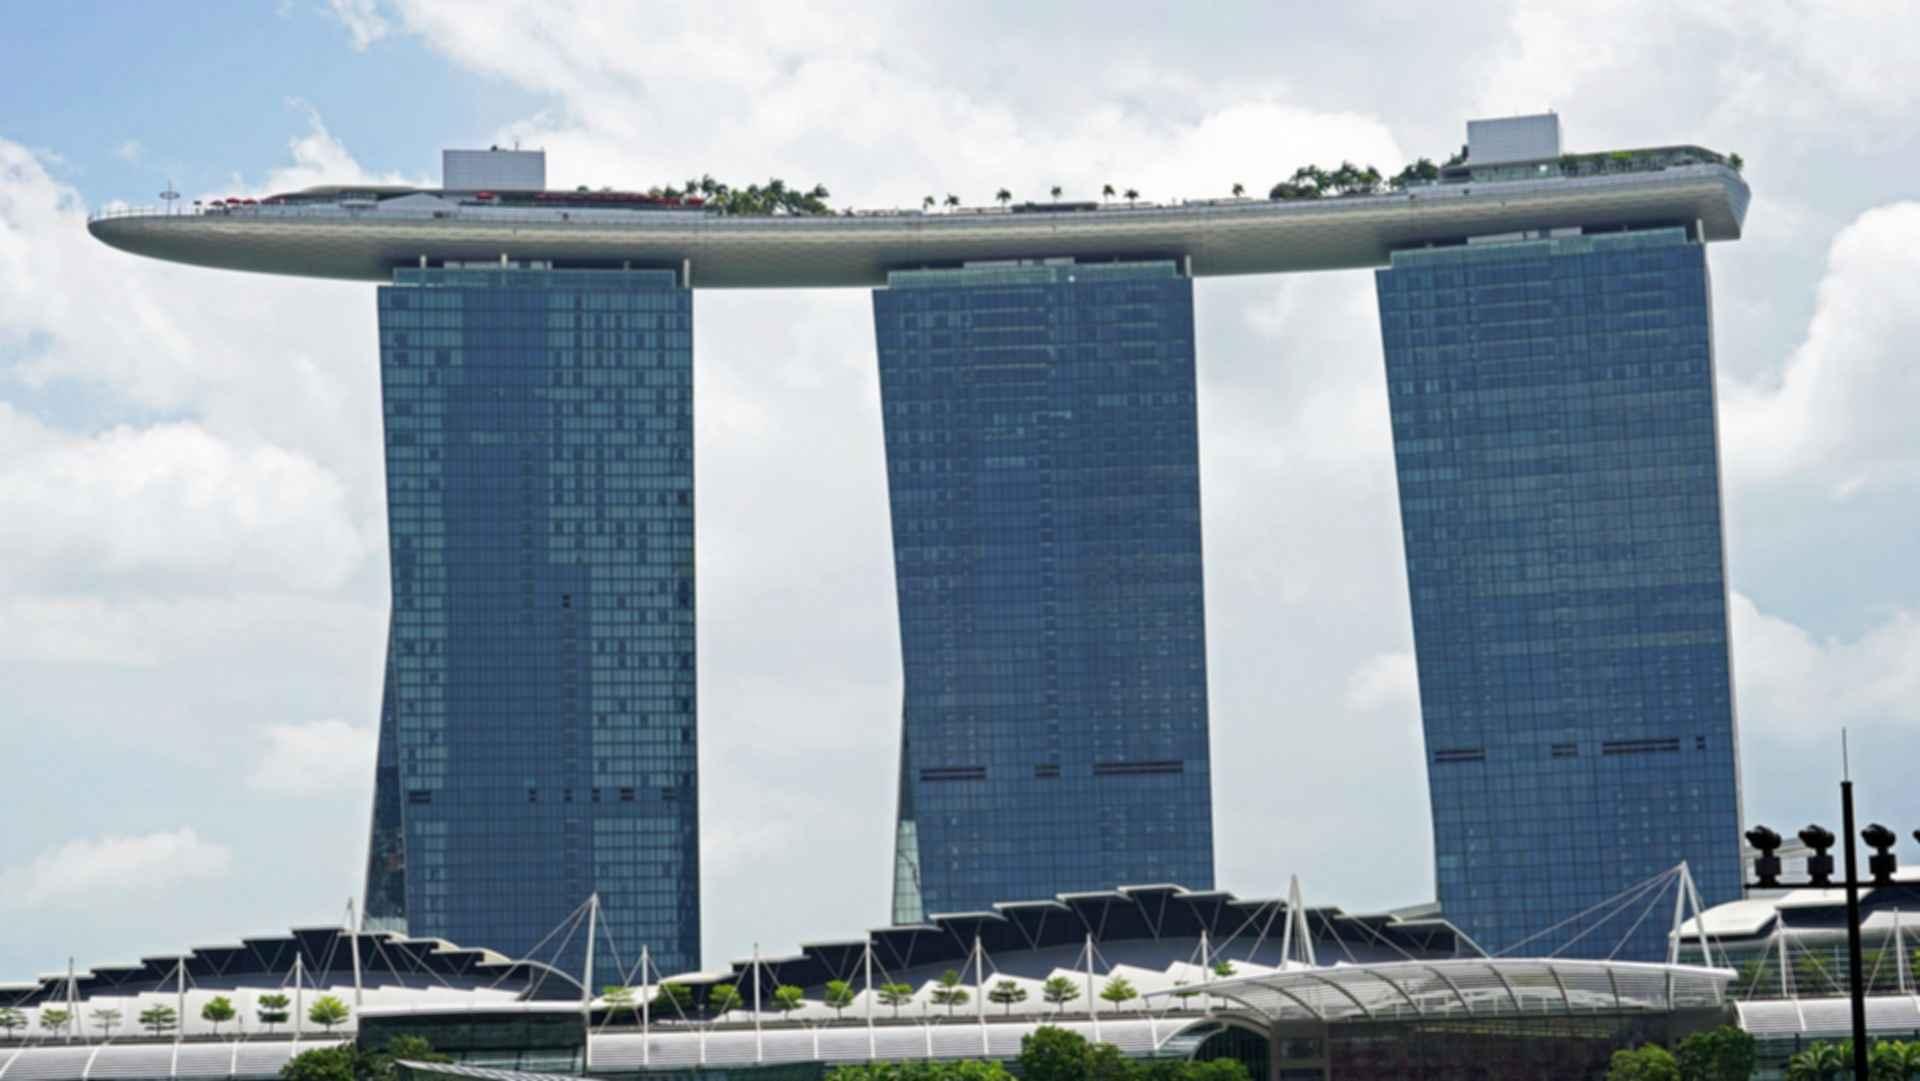 Marina Bay Sands - Front Exterior